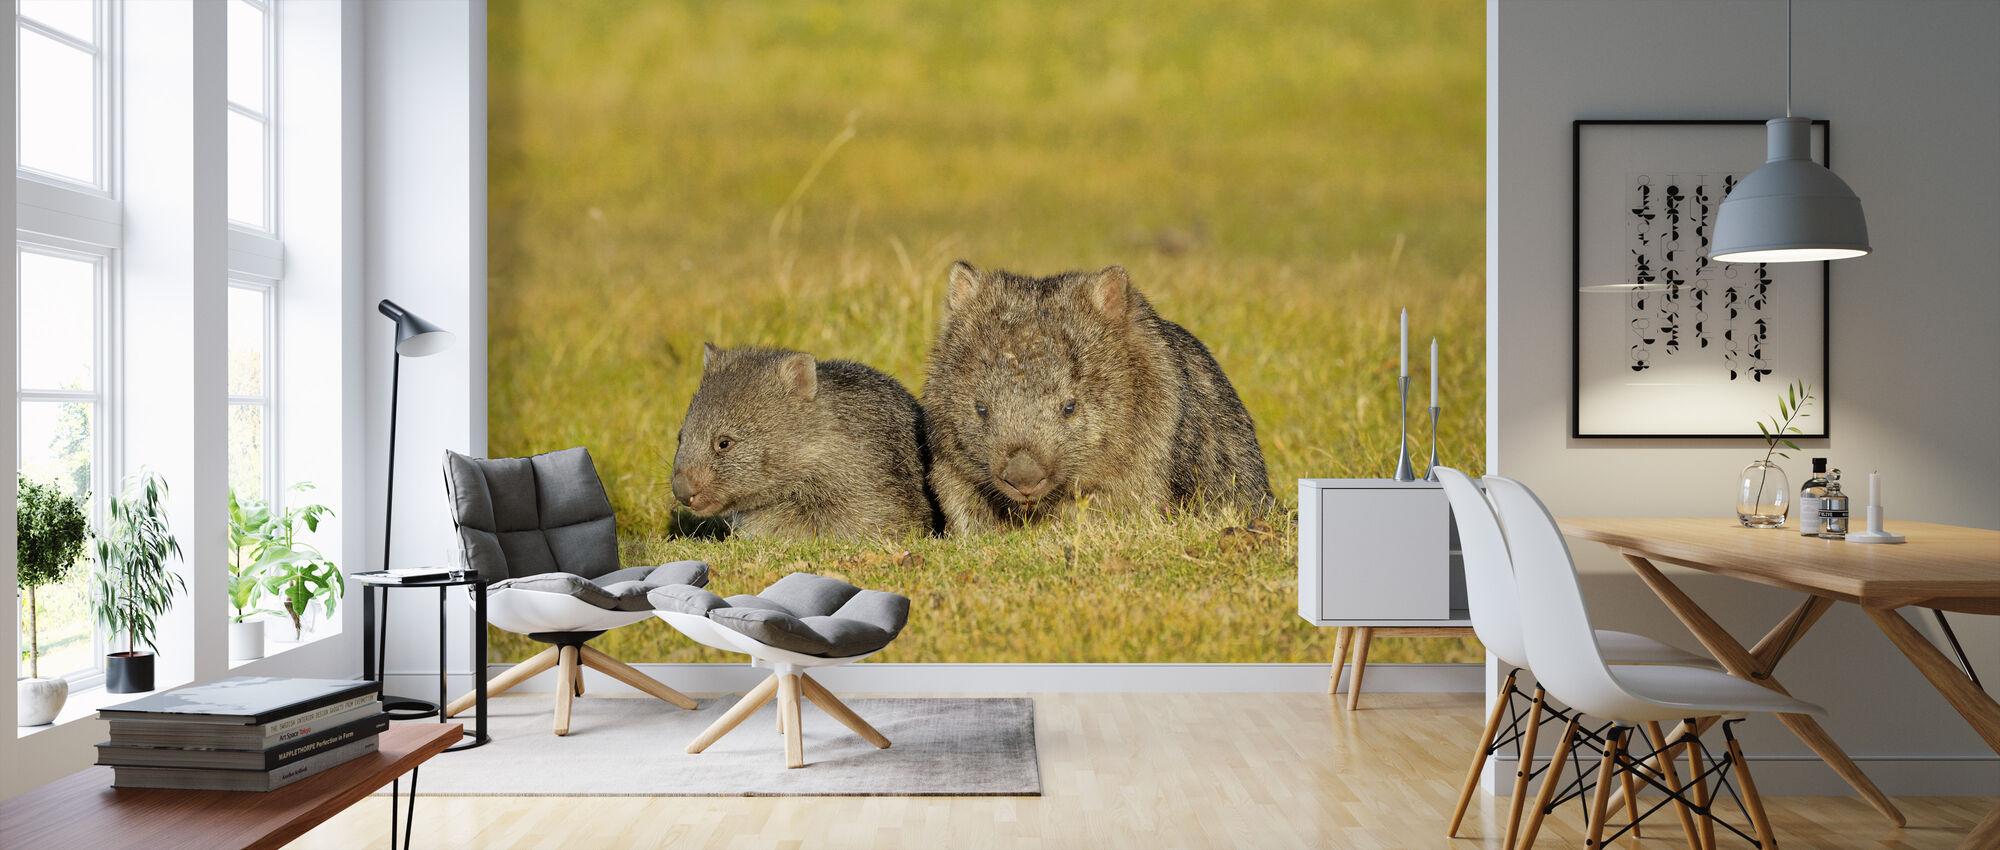 Wombat - Behang - Woonkamer